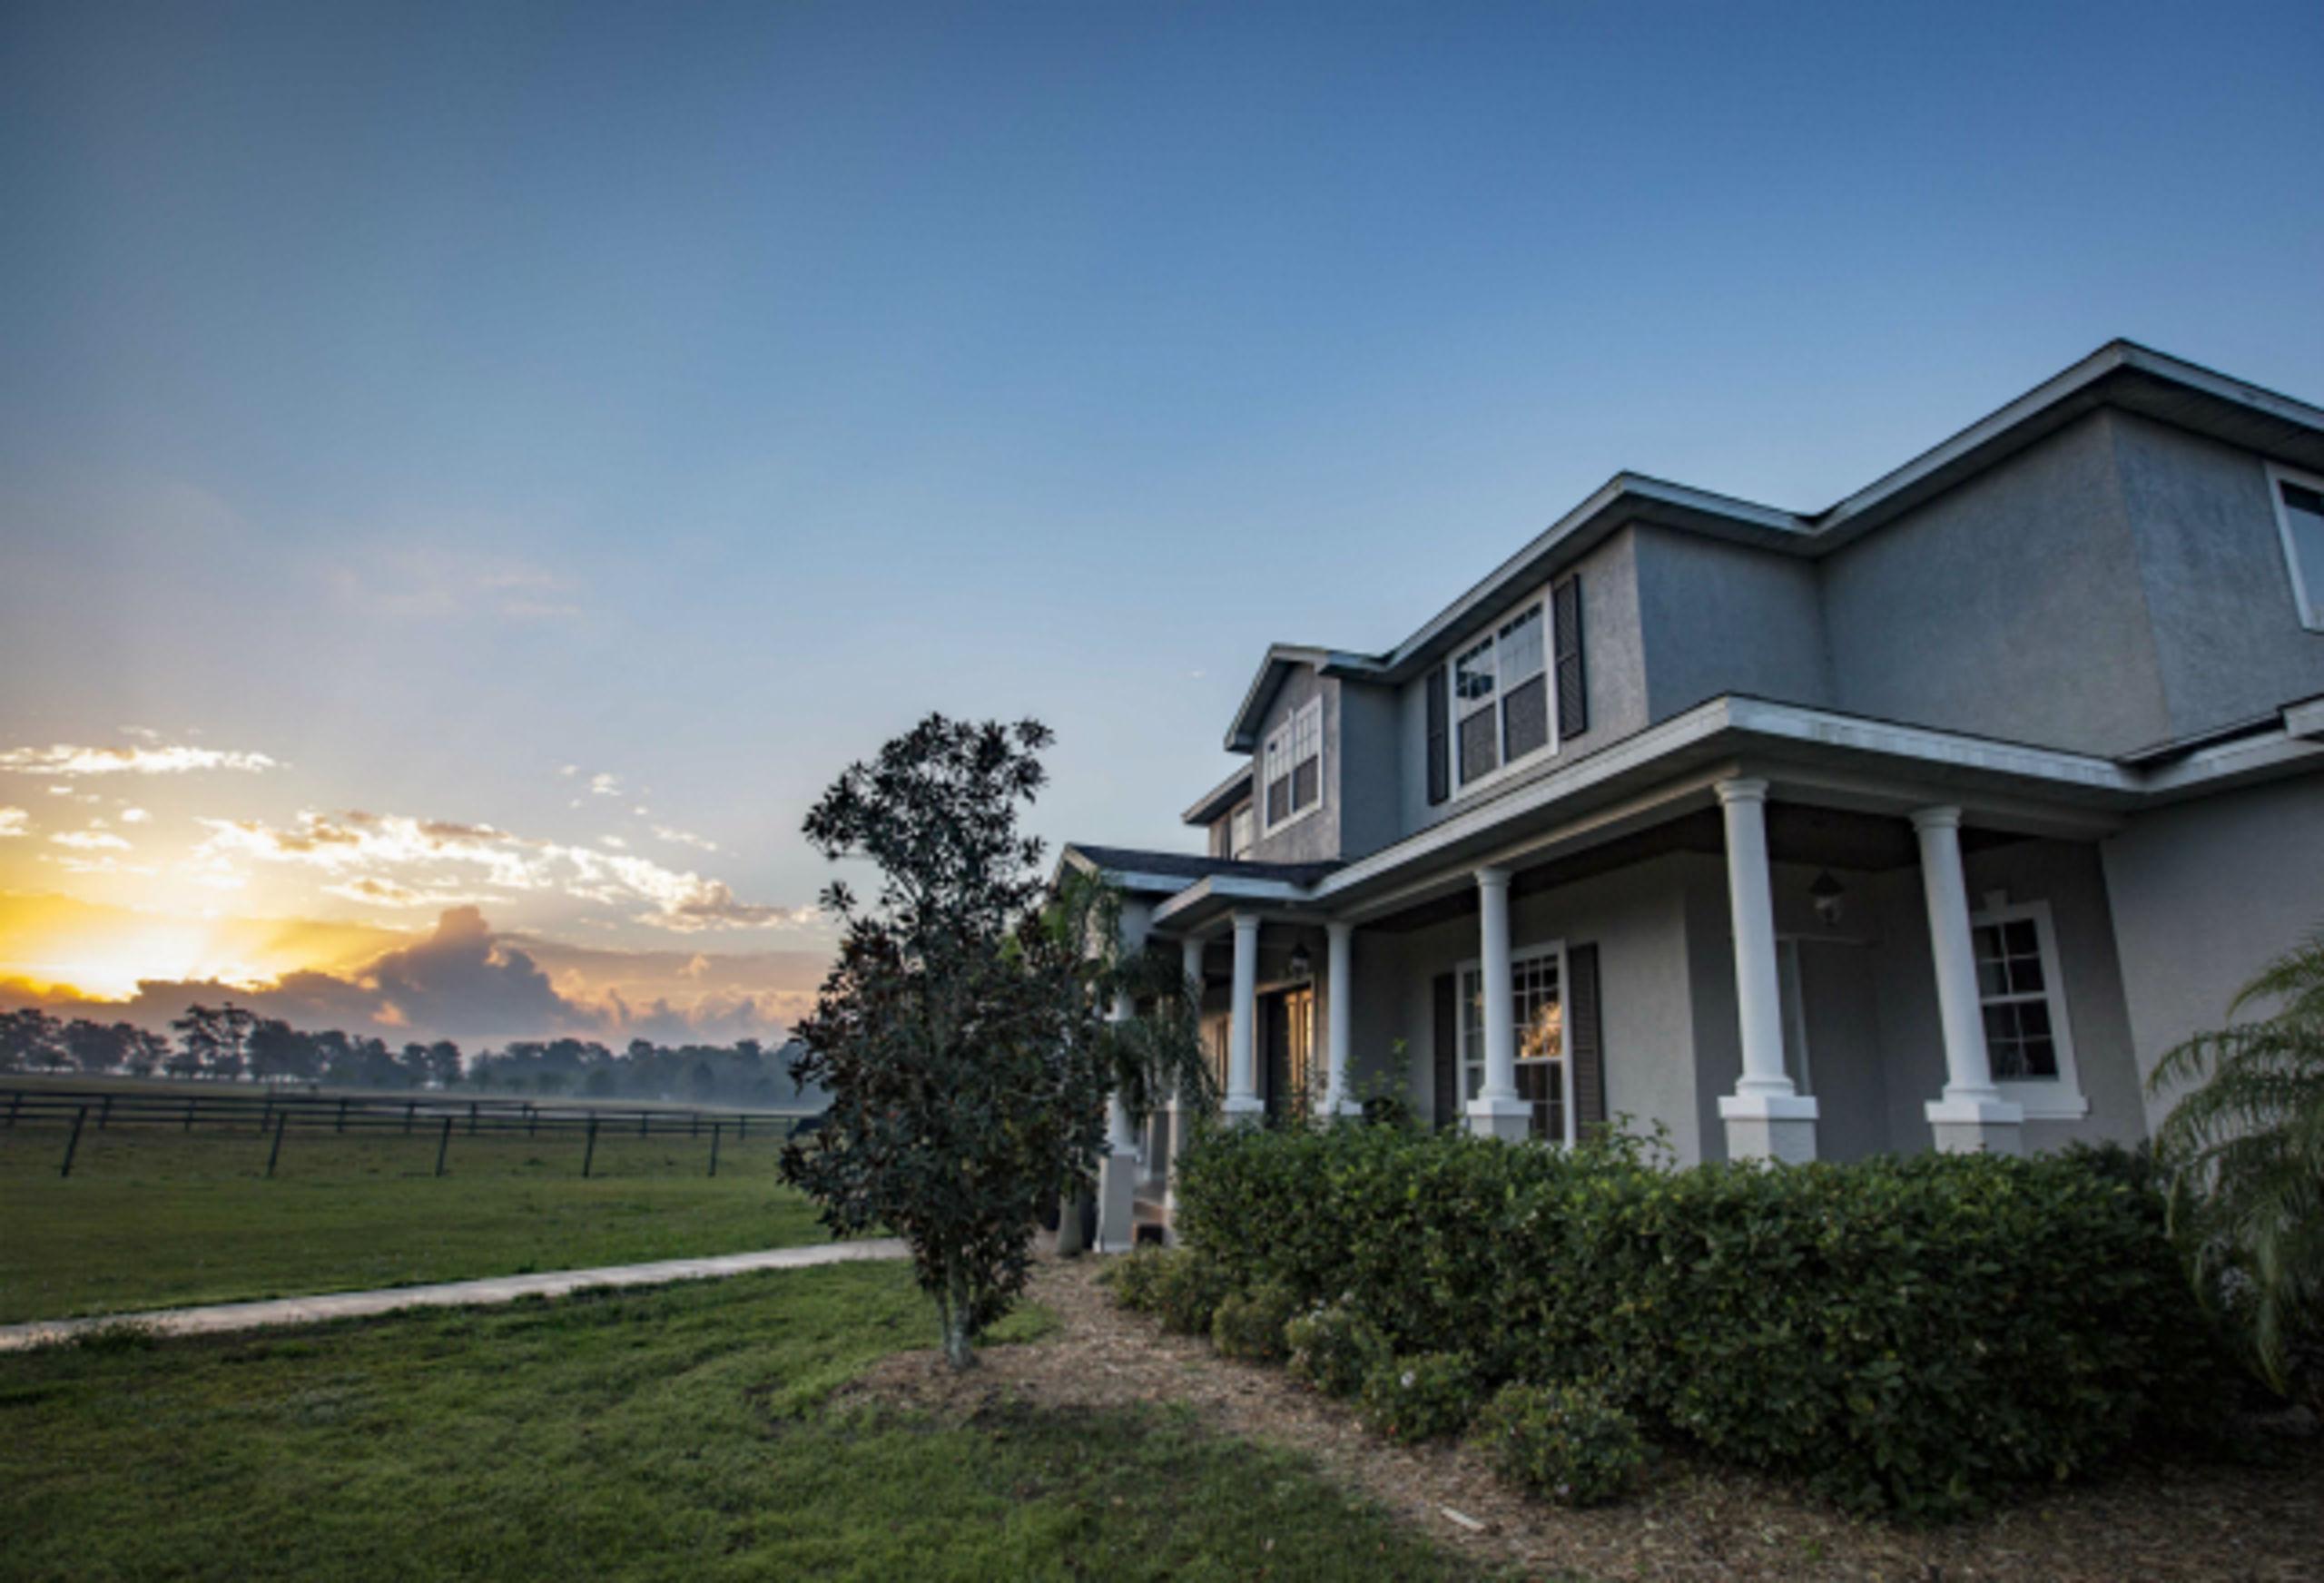 Maui Real Estate | Adam Miller | Keller Williams Realty